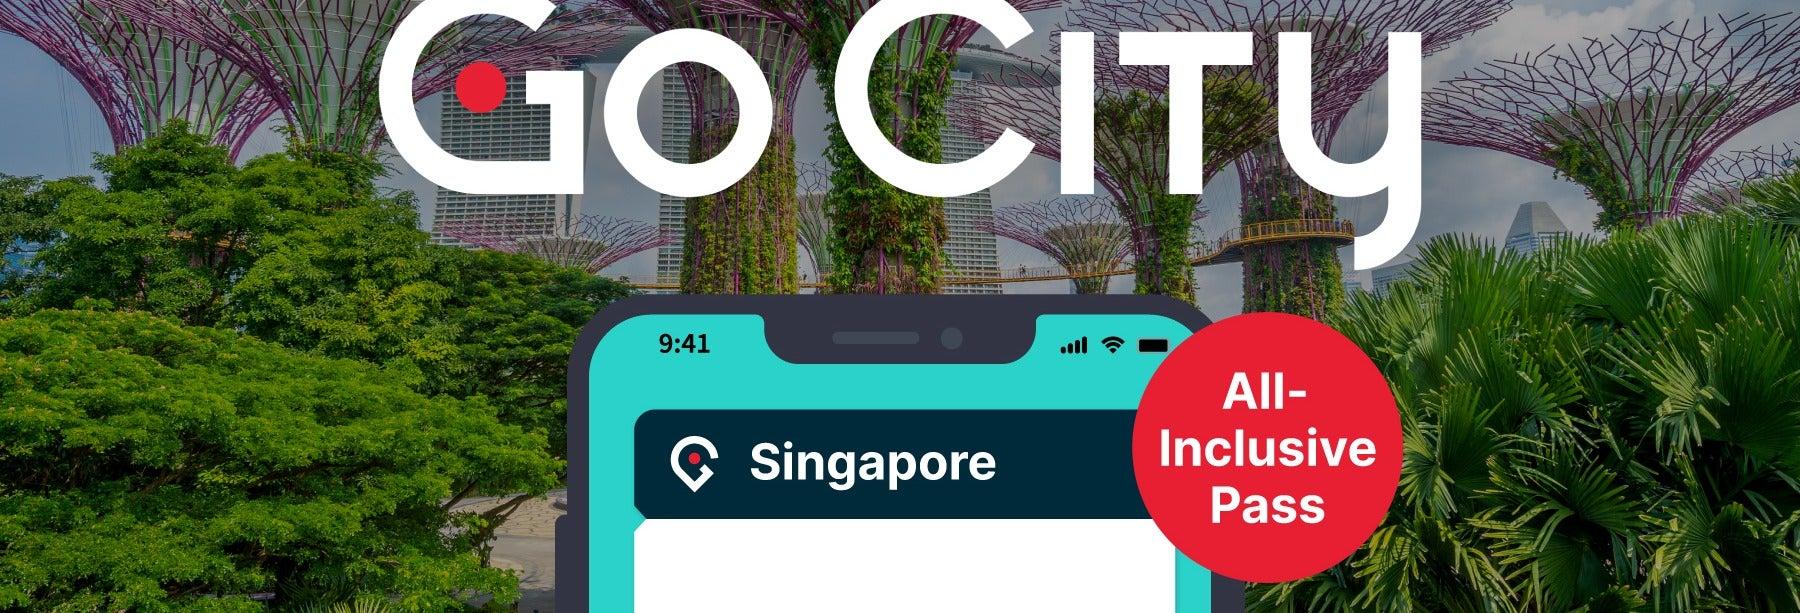 Singapore Unlimited Passion Pass